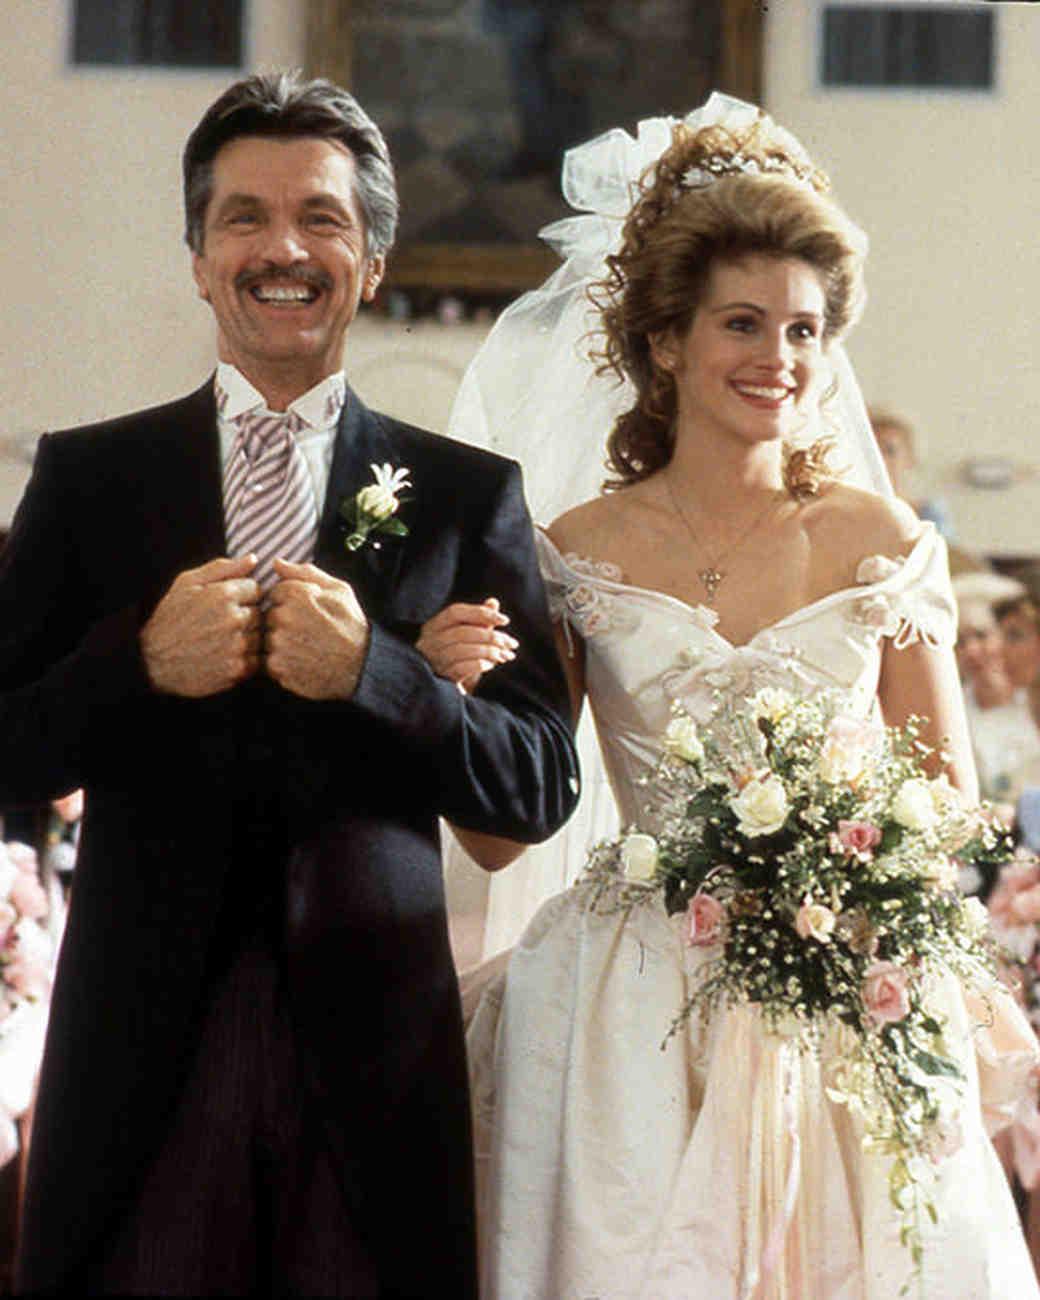 movie-wedding-dresses-steel-magnolias-julia-roberts-0316.jpg